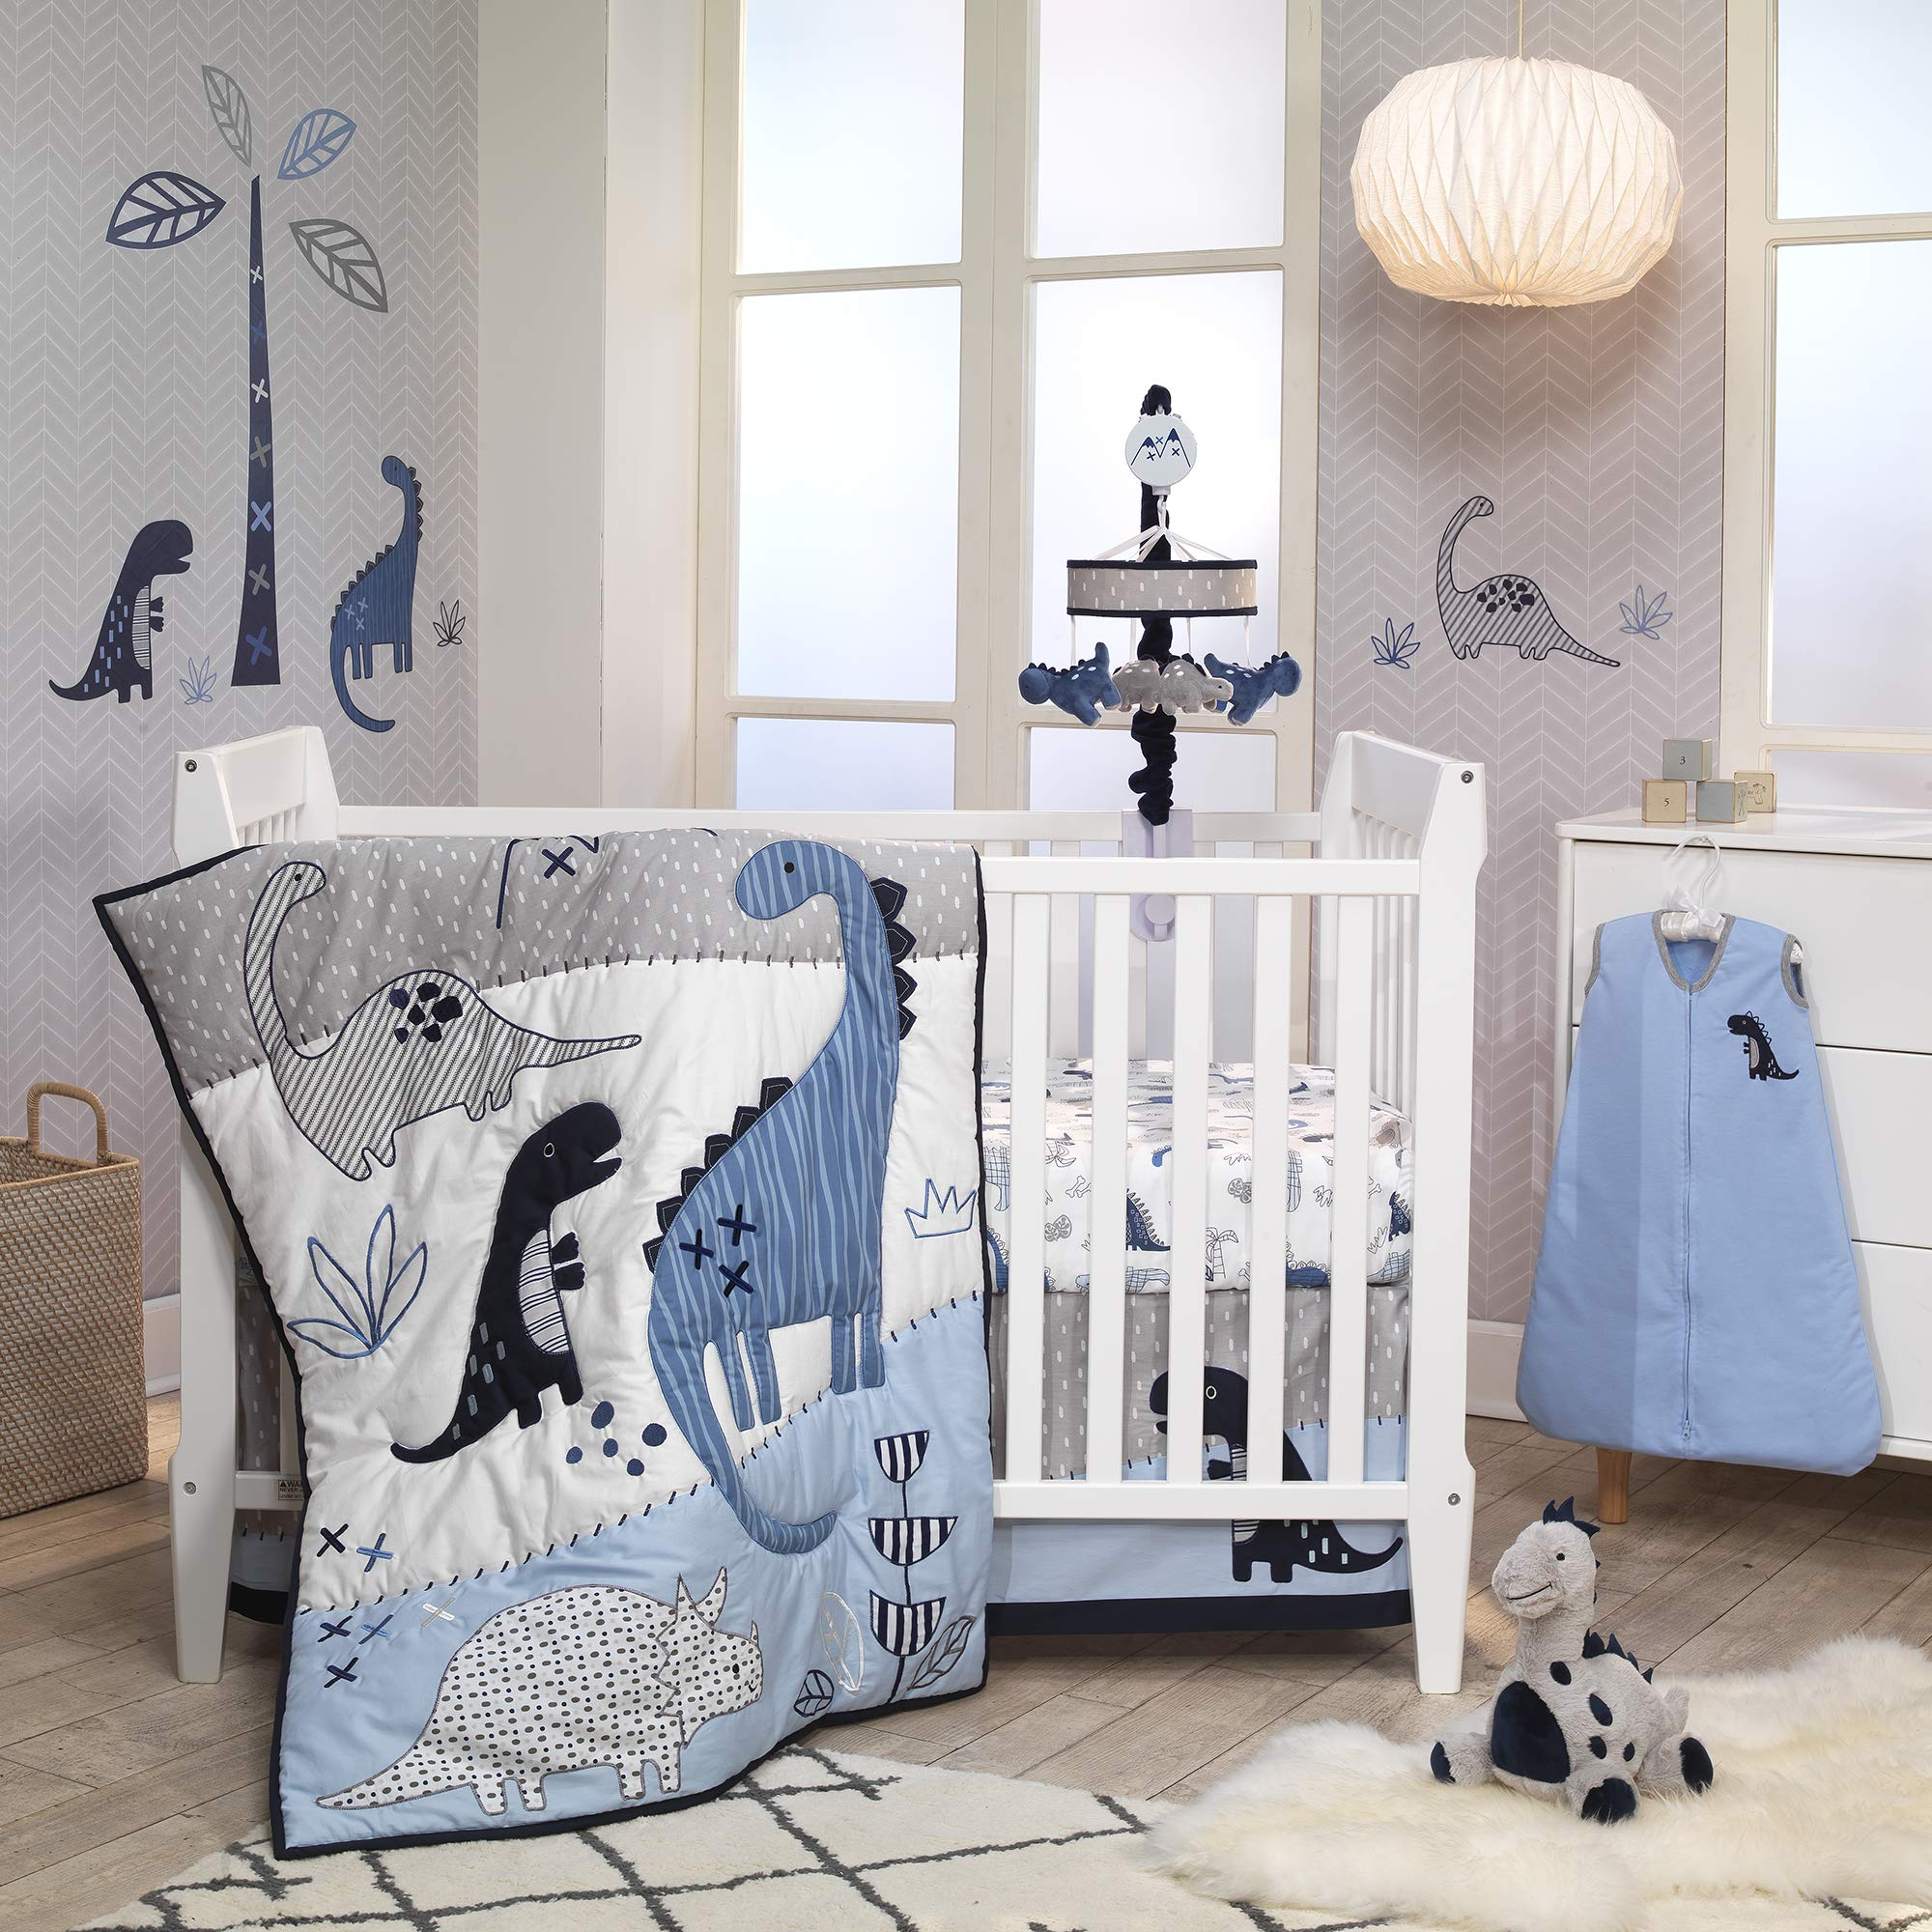 Lambs & Ivy Baby Dino Blue/White Dinosaur Nursery 6-Piece Crib Bedding Set